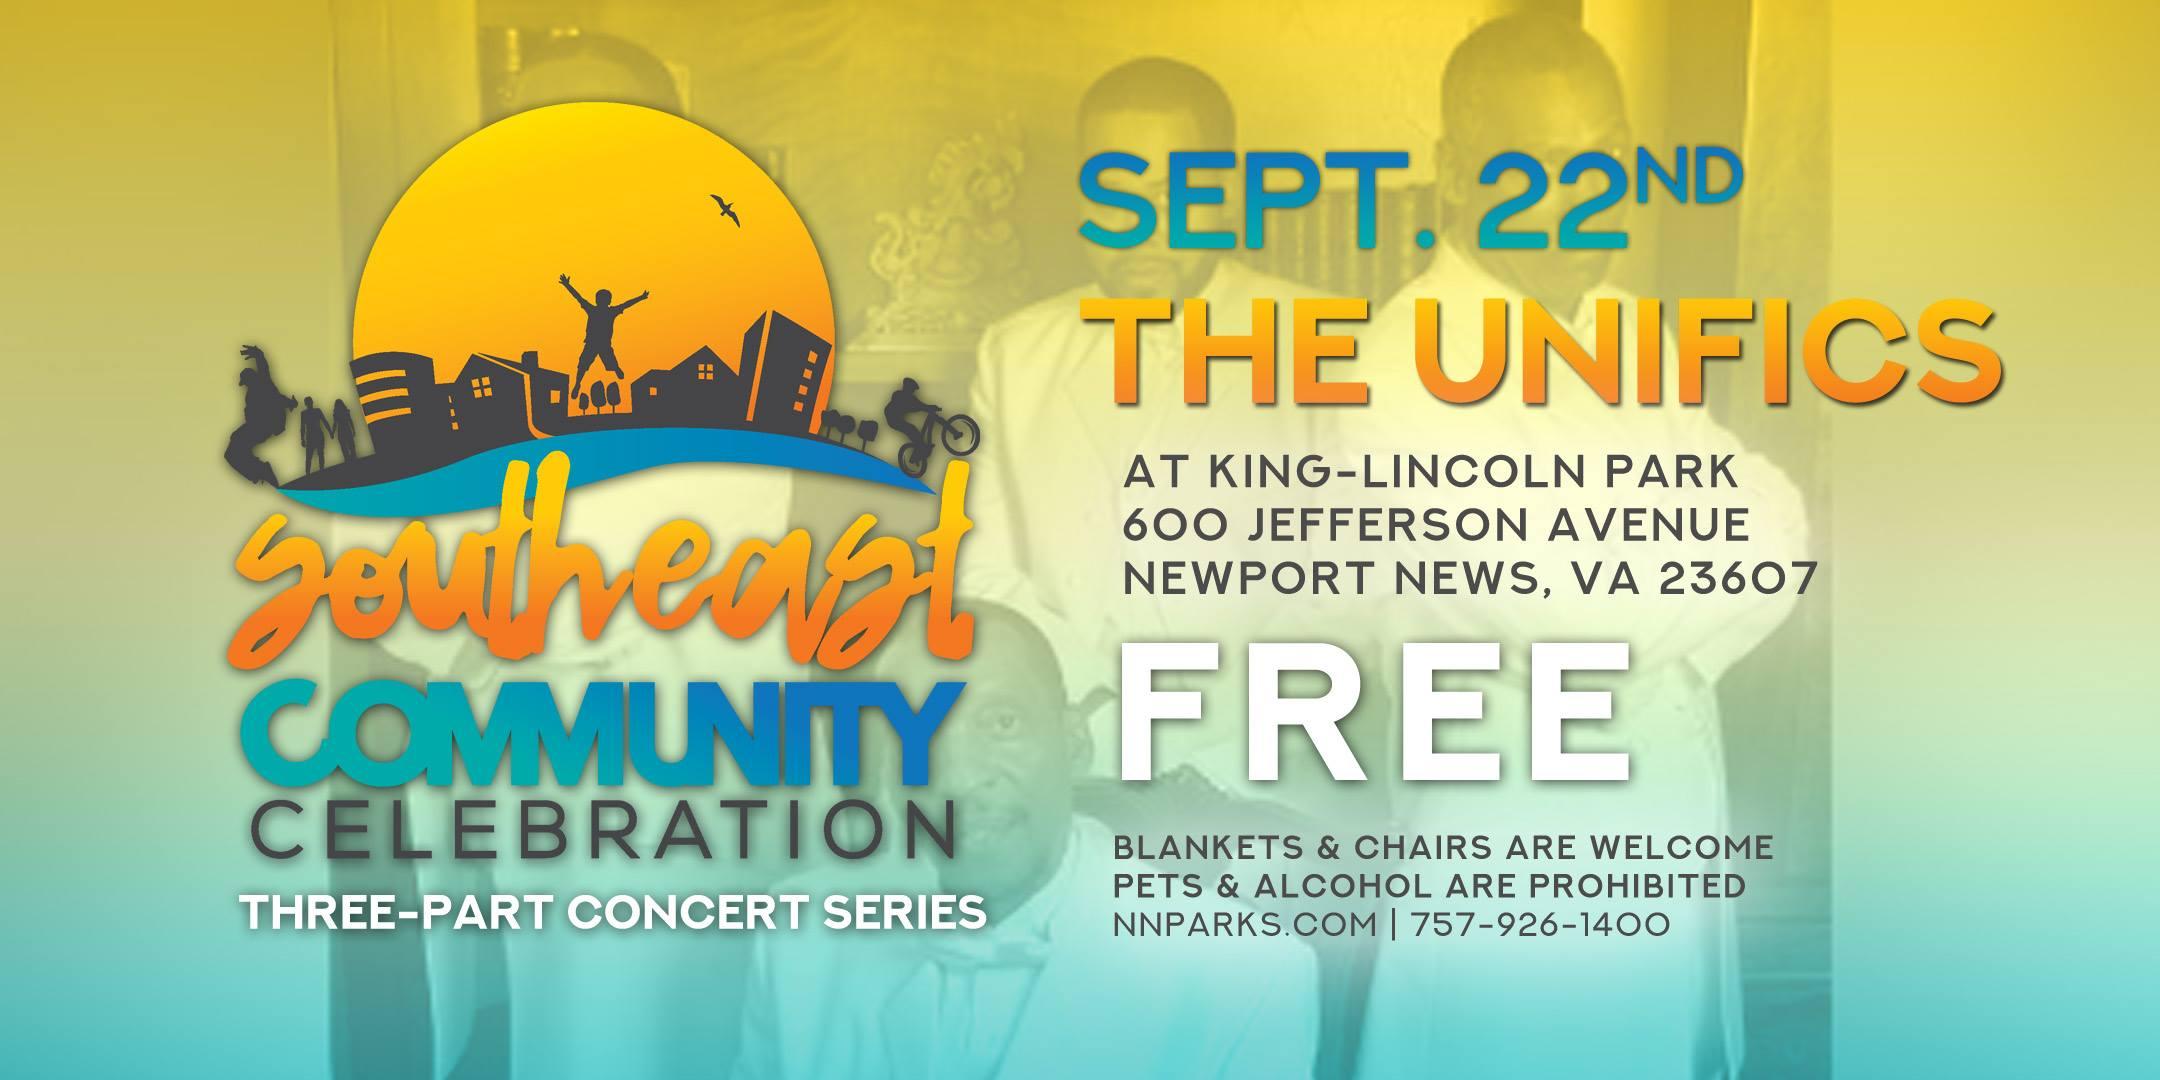 Southeast Community Concert large 9.22.18.jpg